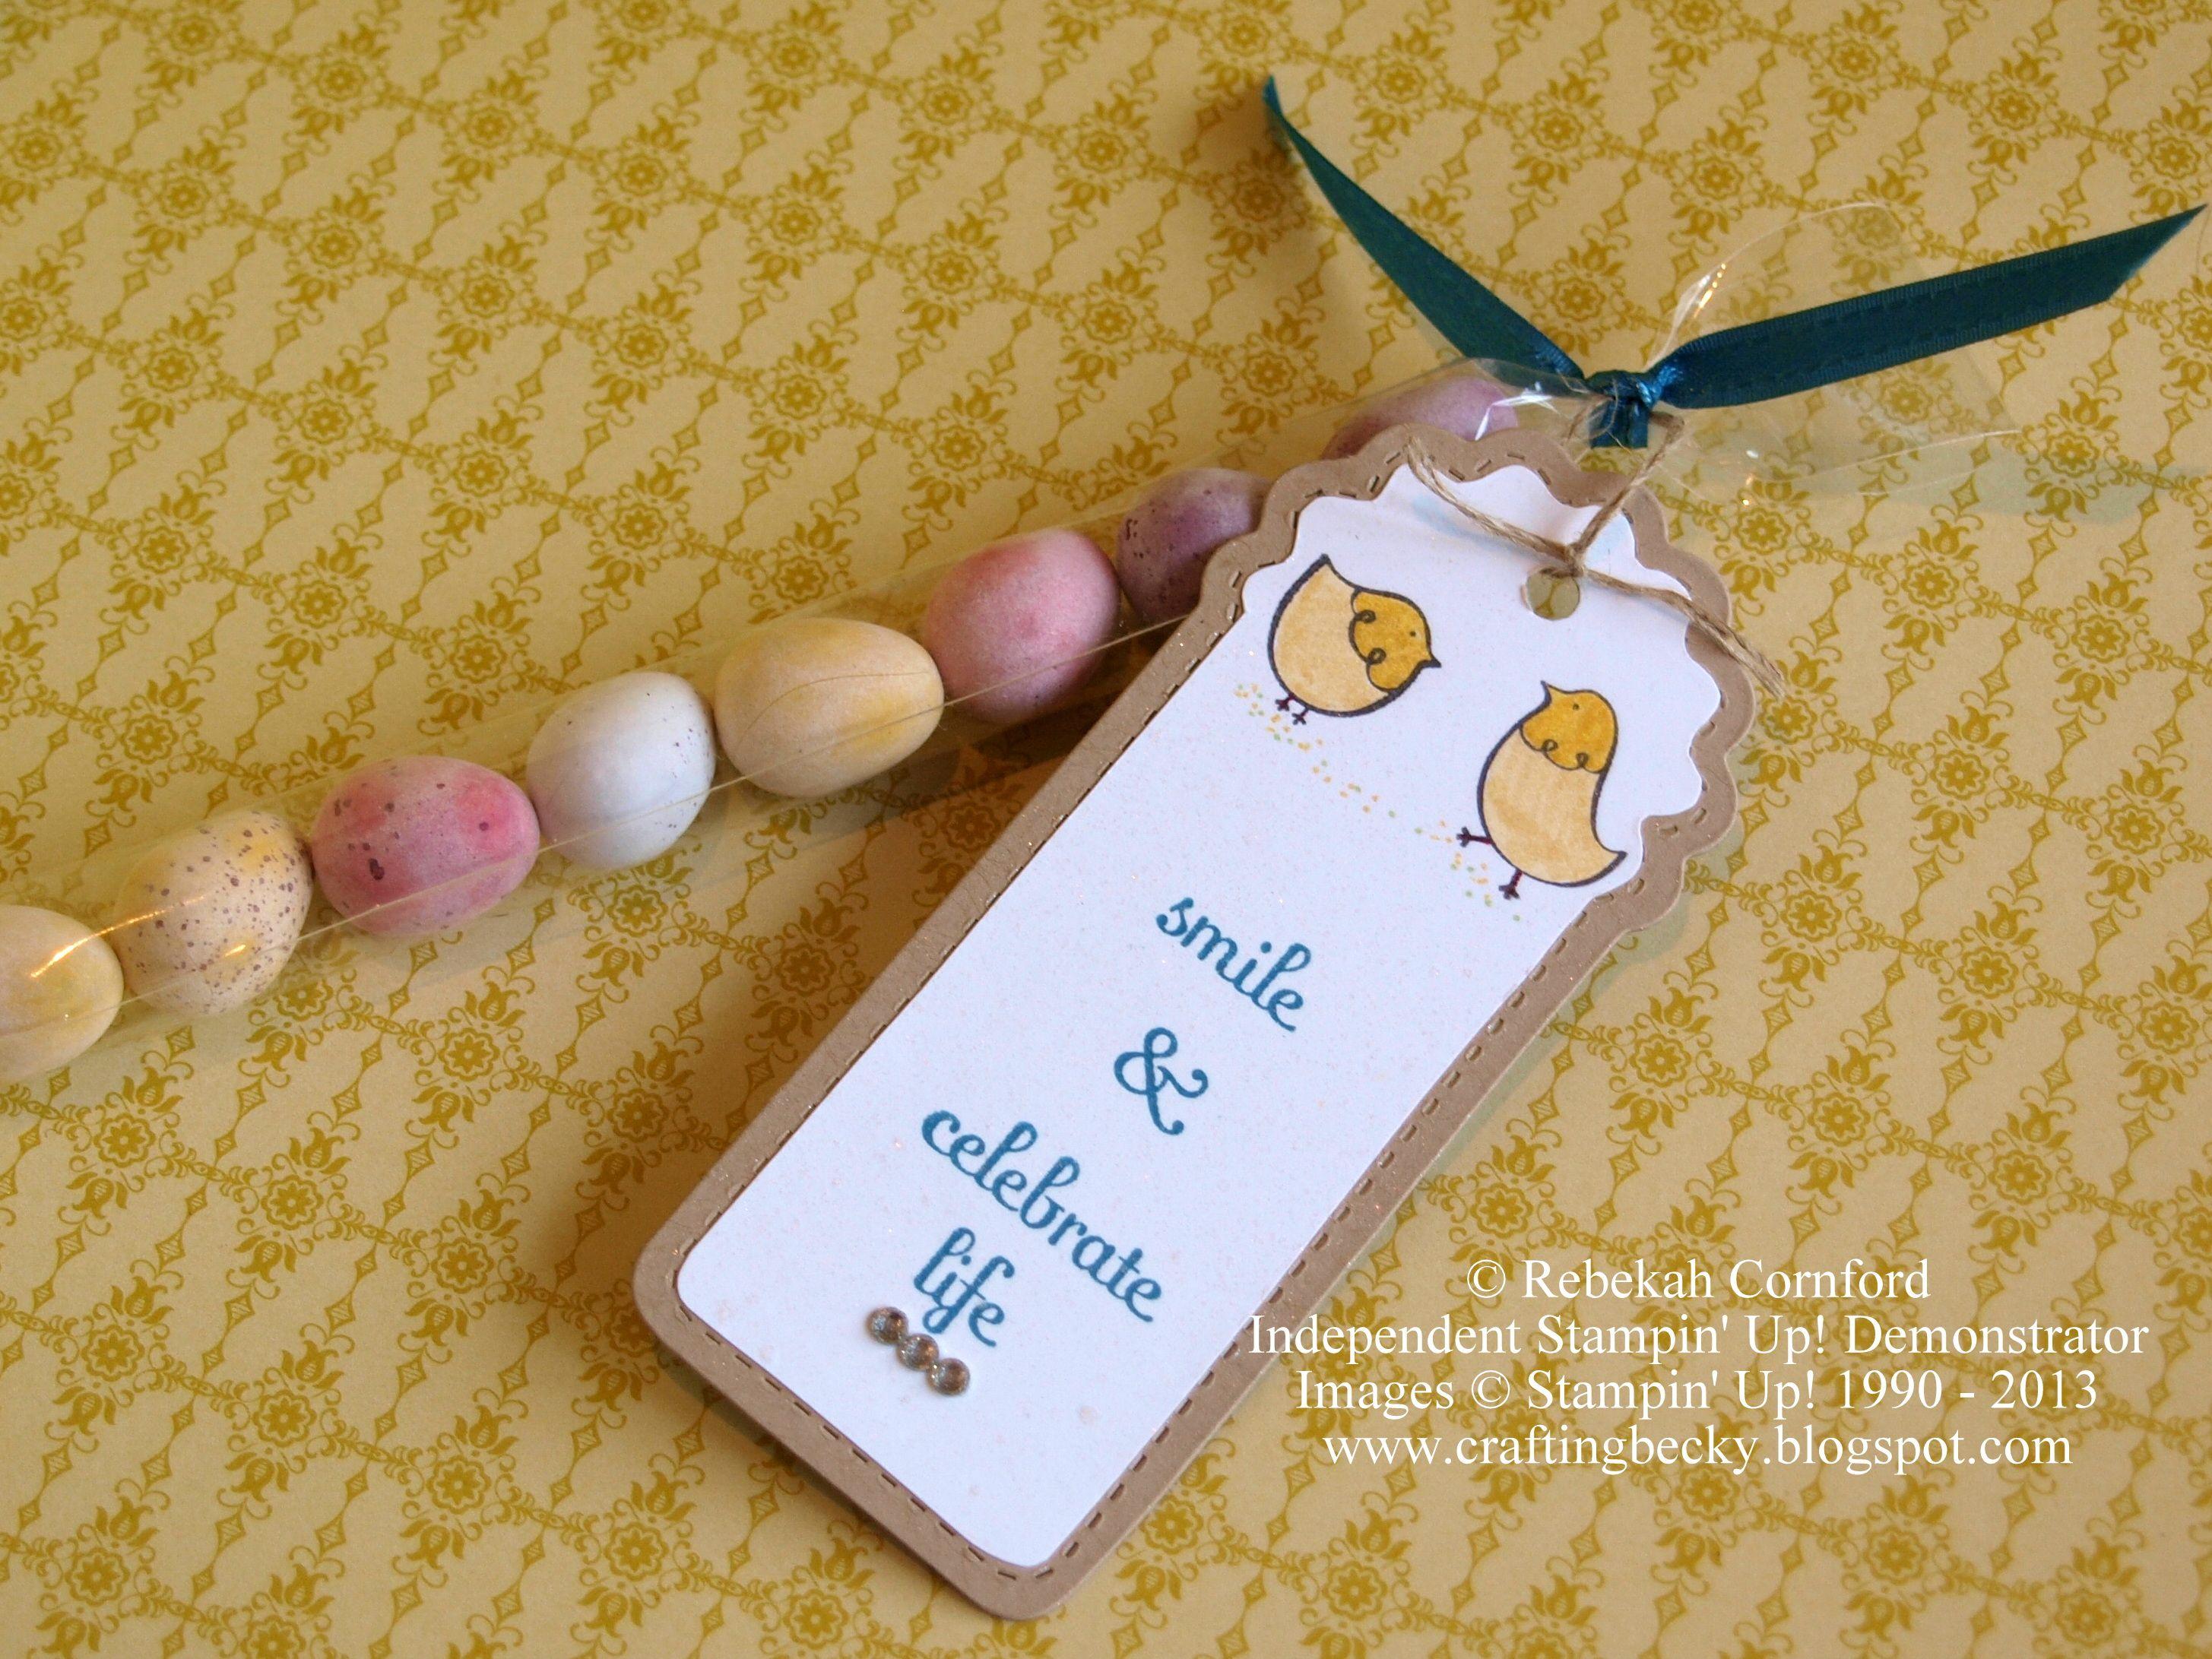 Stampin up easter gift using flock together fabulous phrases stampin up easter gift using flock together fabulous phrases two negle Choice Image